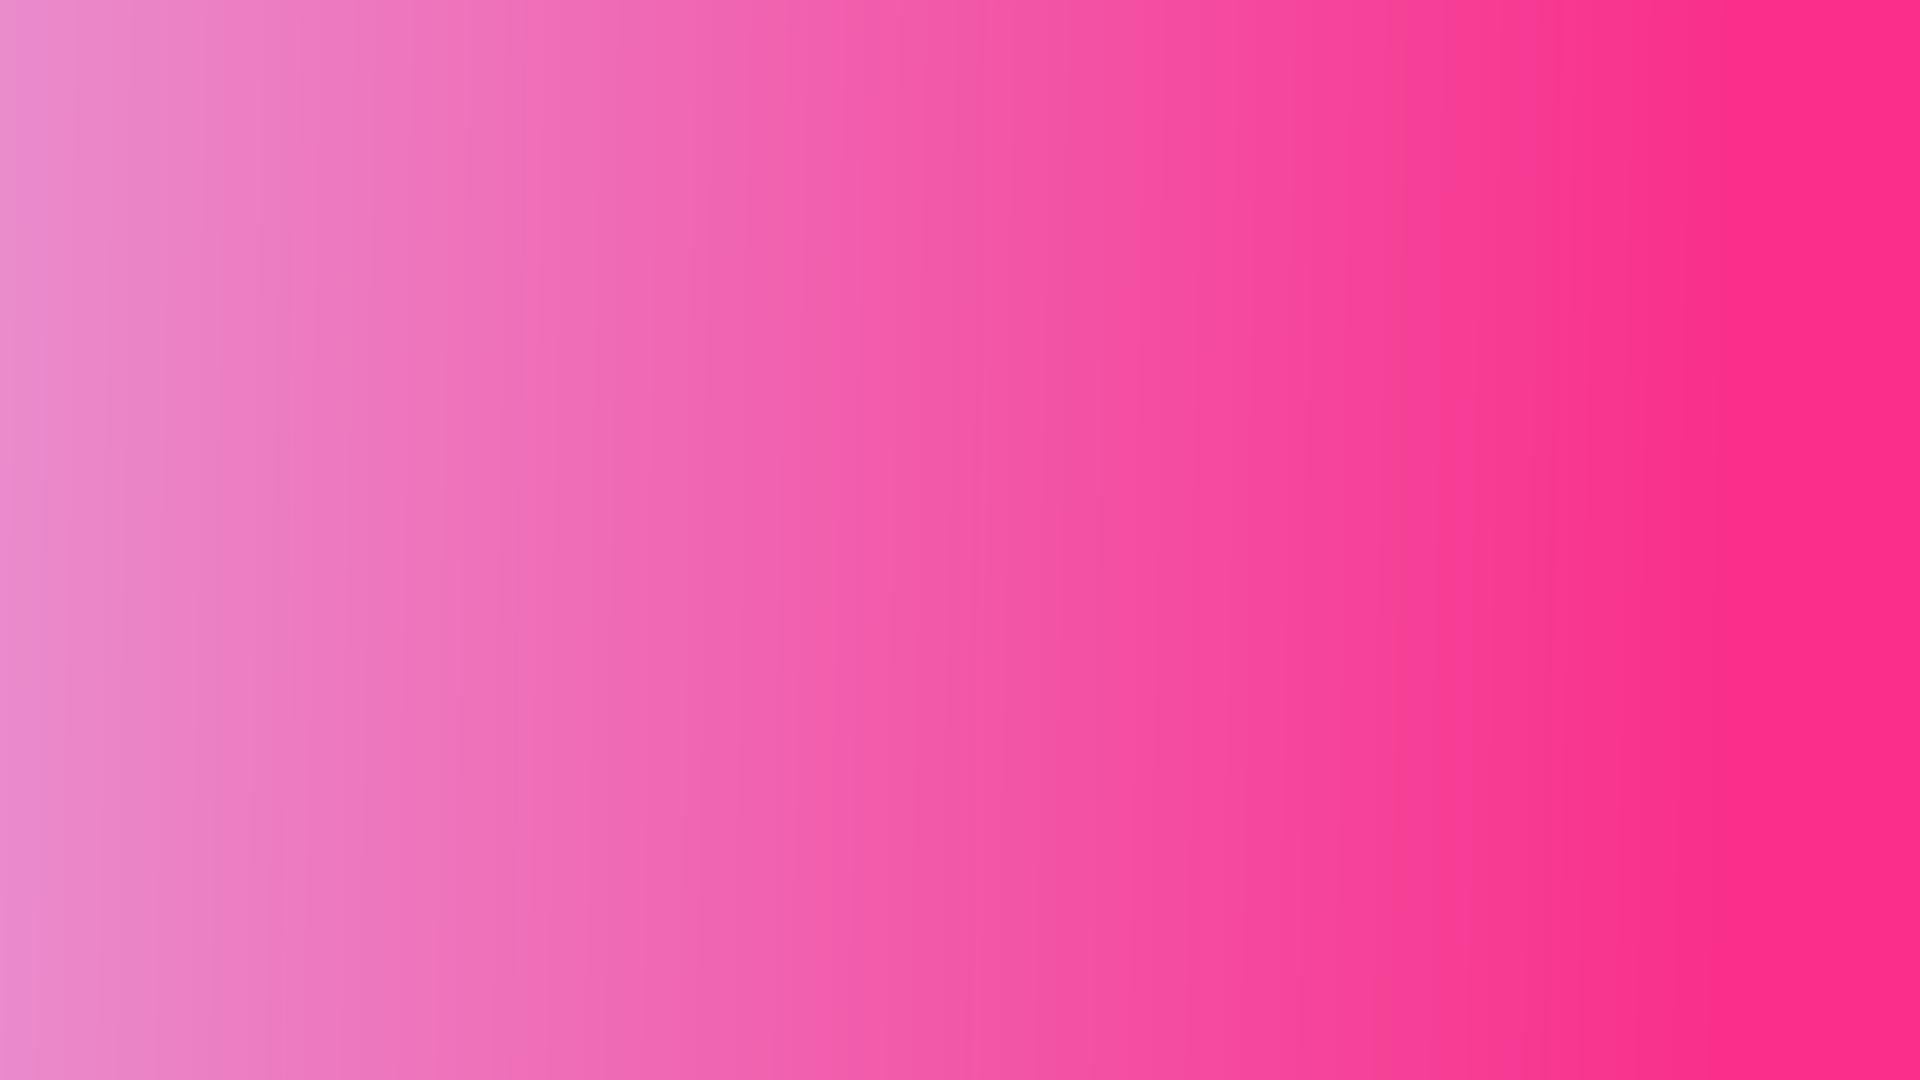 pink pants Gradient